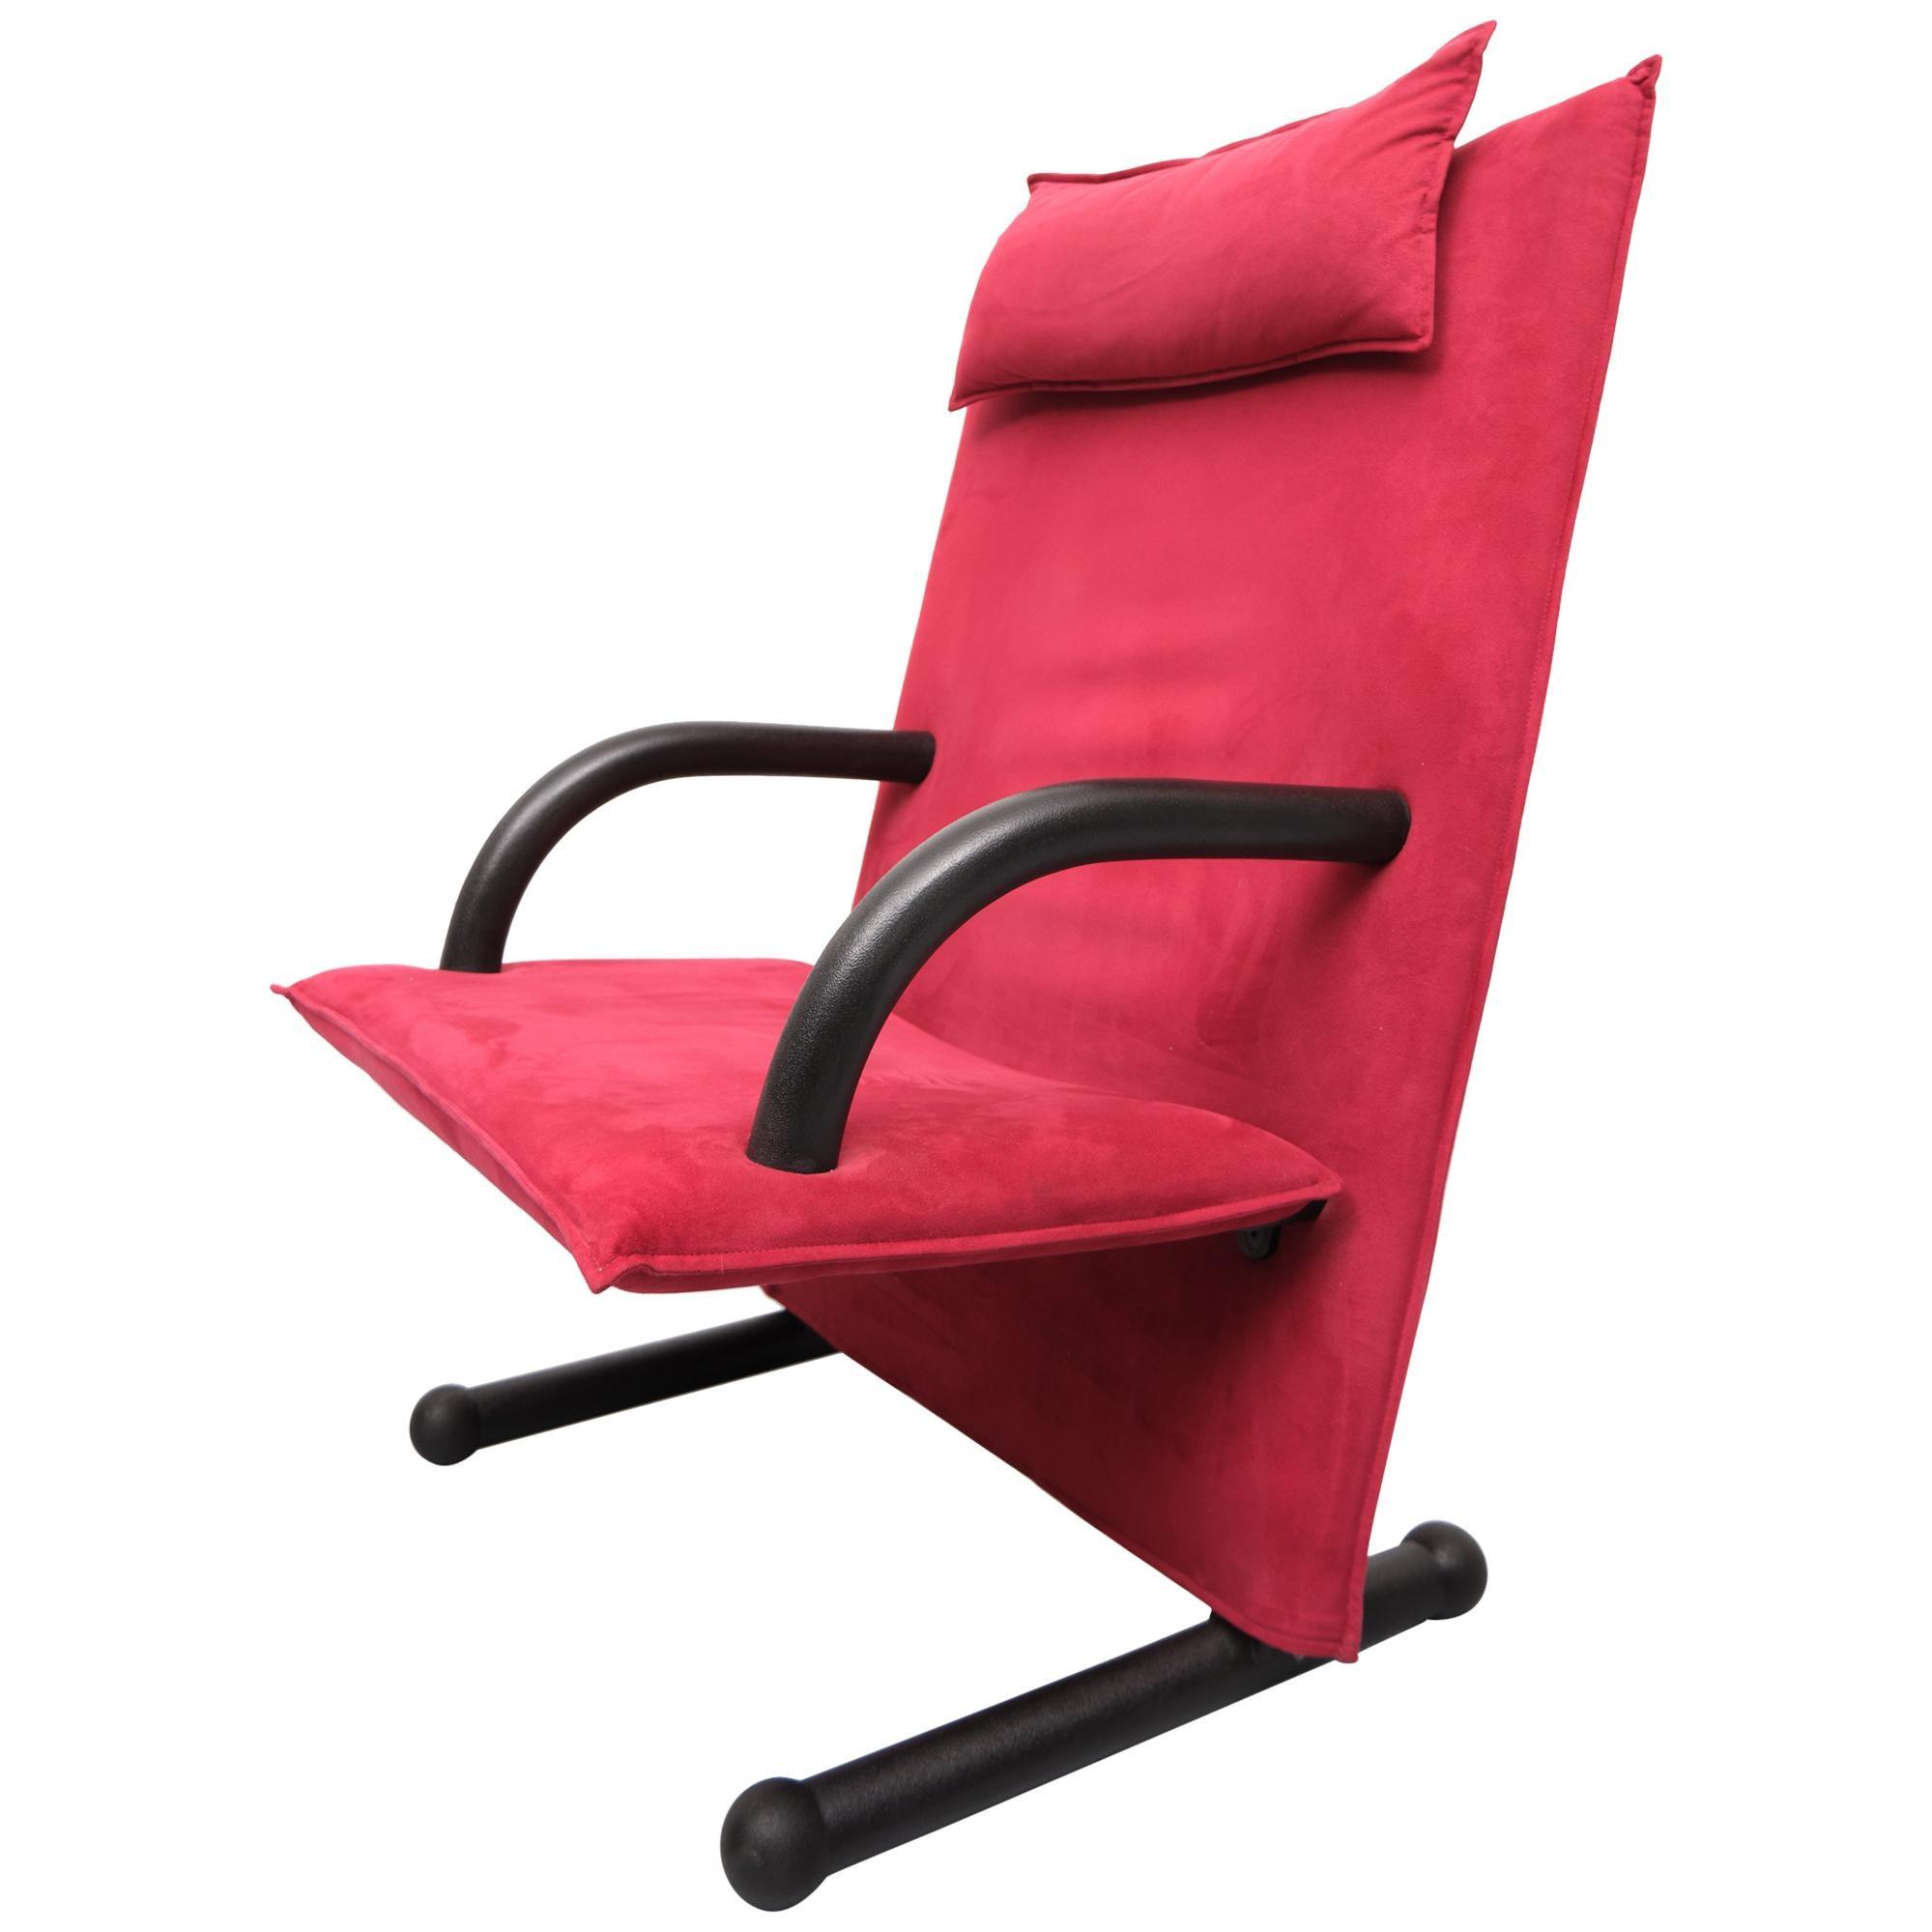 T Line Postmodern Arm Chair Arflex, 1980s